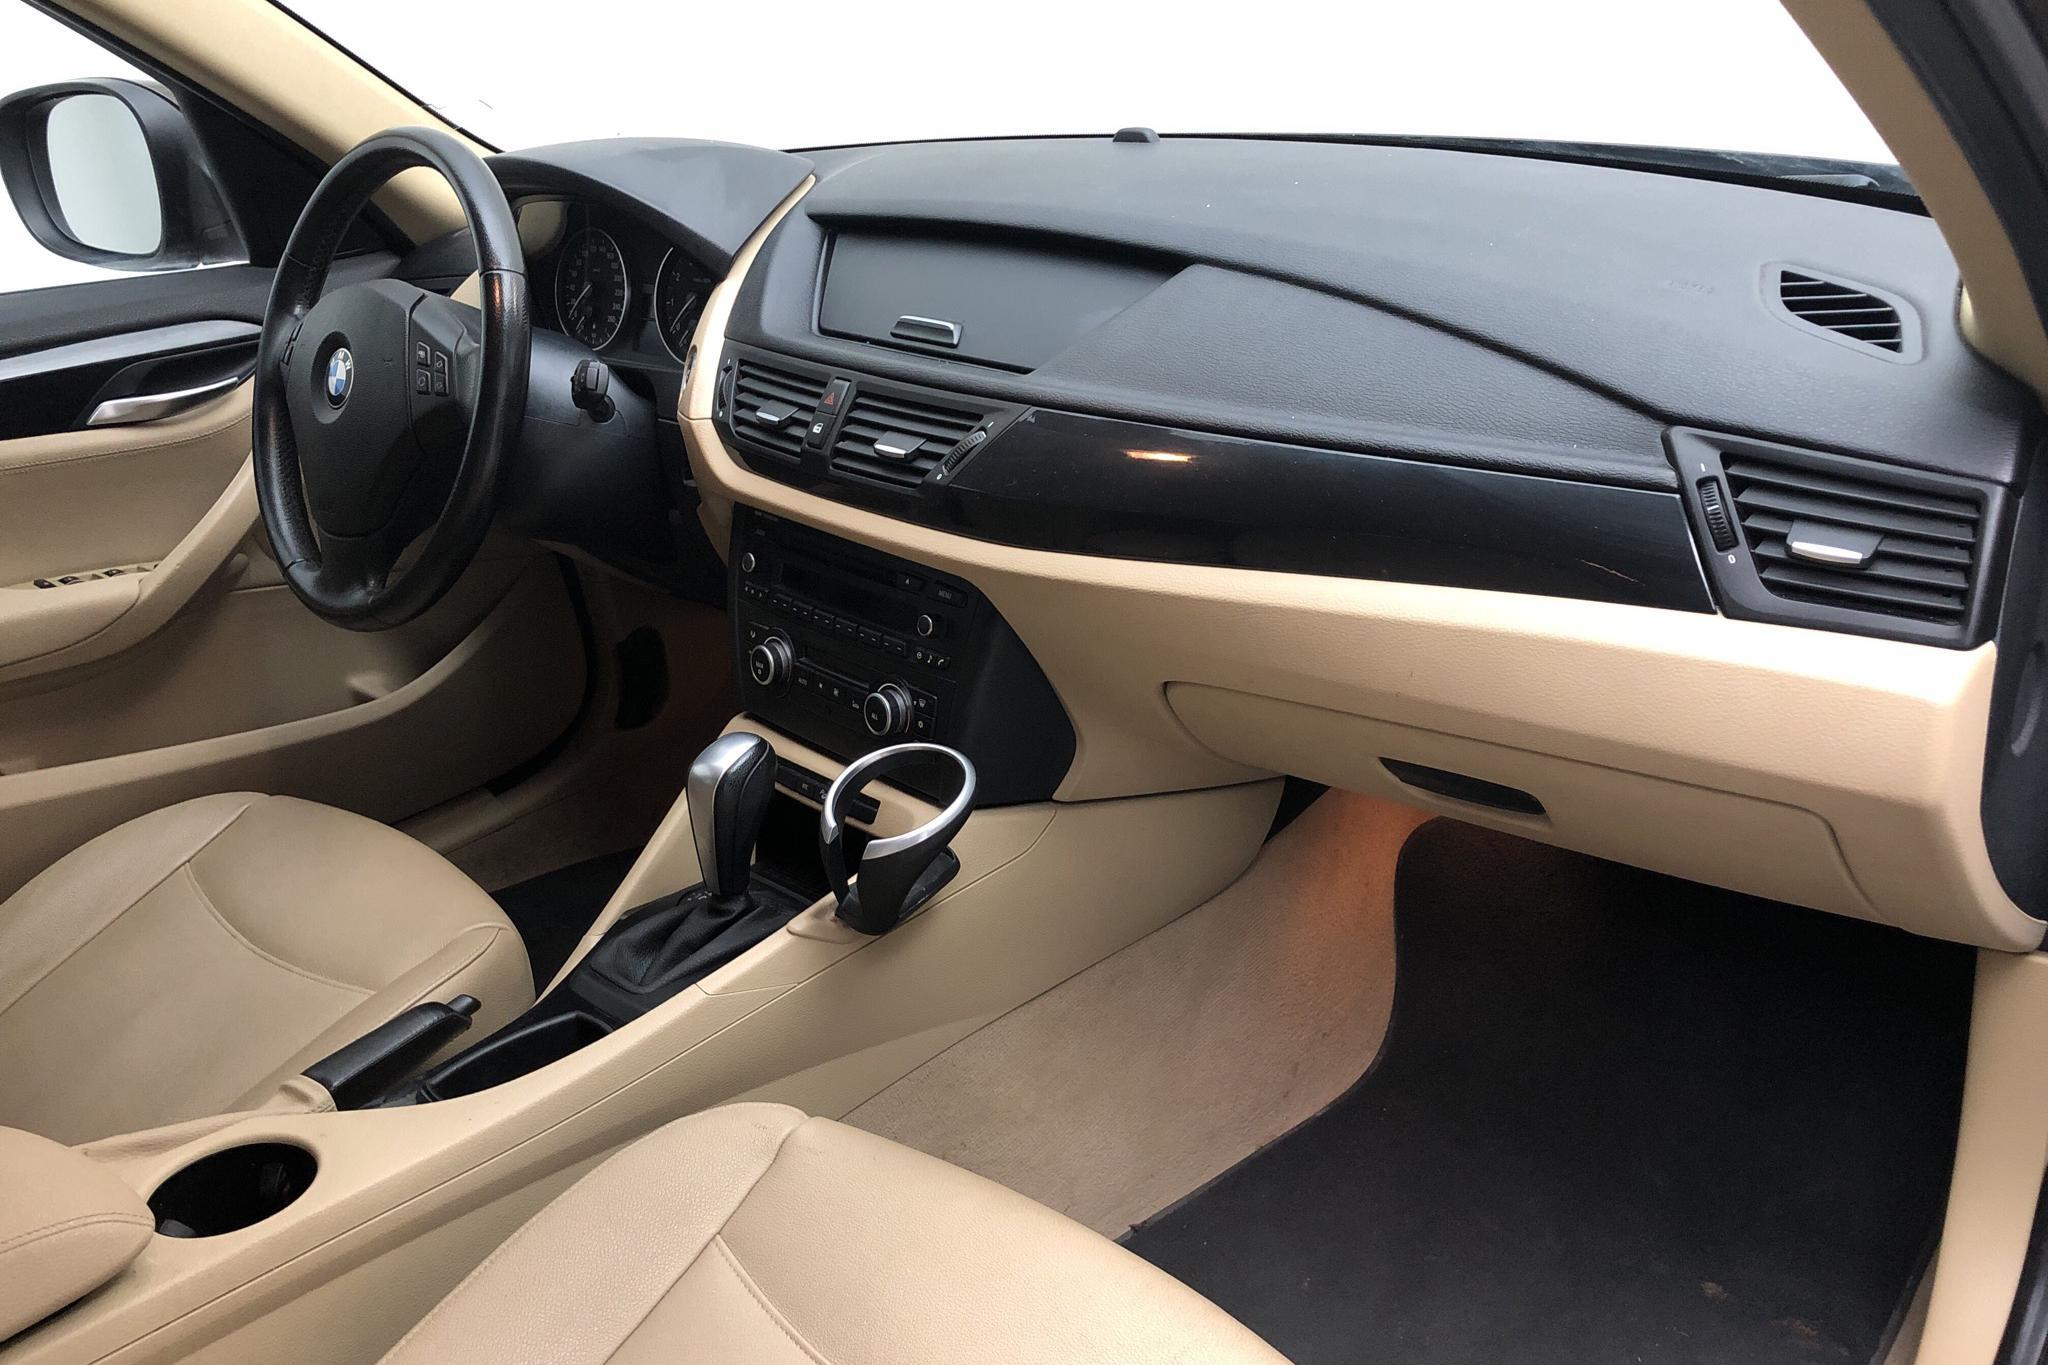 BMW X1 xDrive28i, E84 (258hk) - 14 059 mil - Automat - brun - 2010